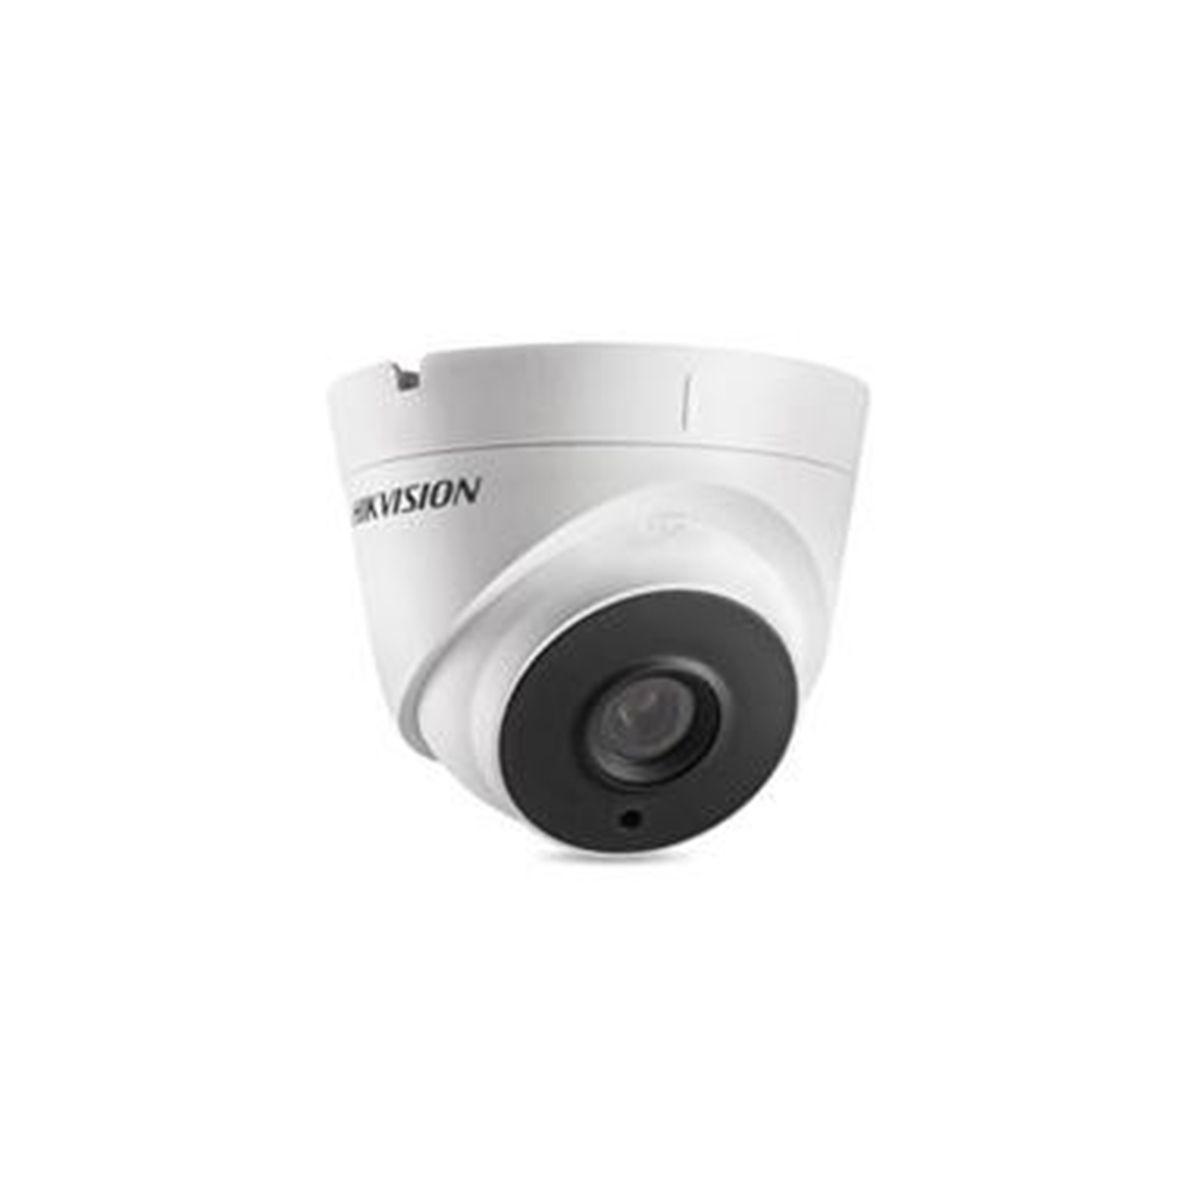 Cámara Hikvision Turbo HD Tipo domo DS-2CE56H0T-IT3F